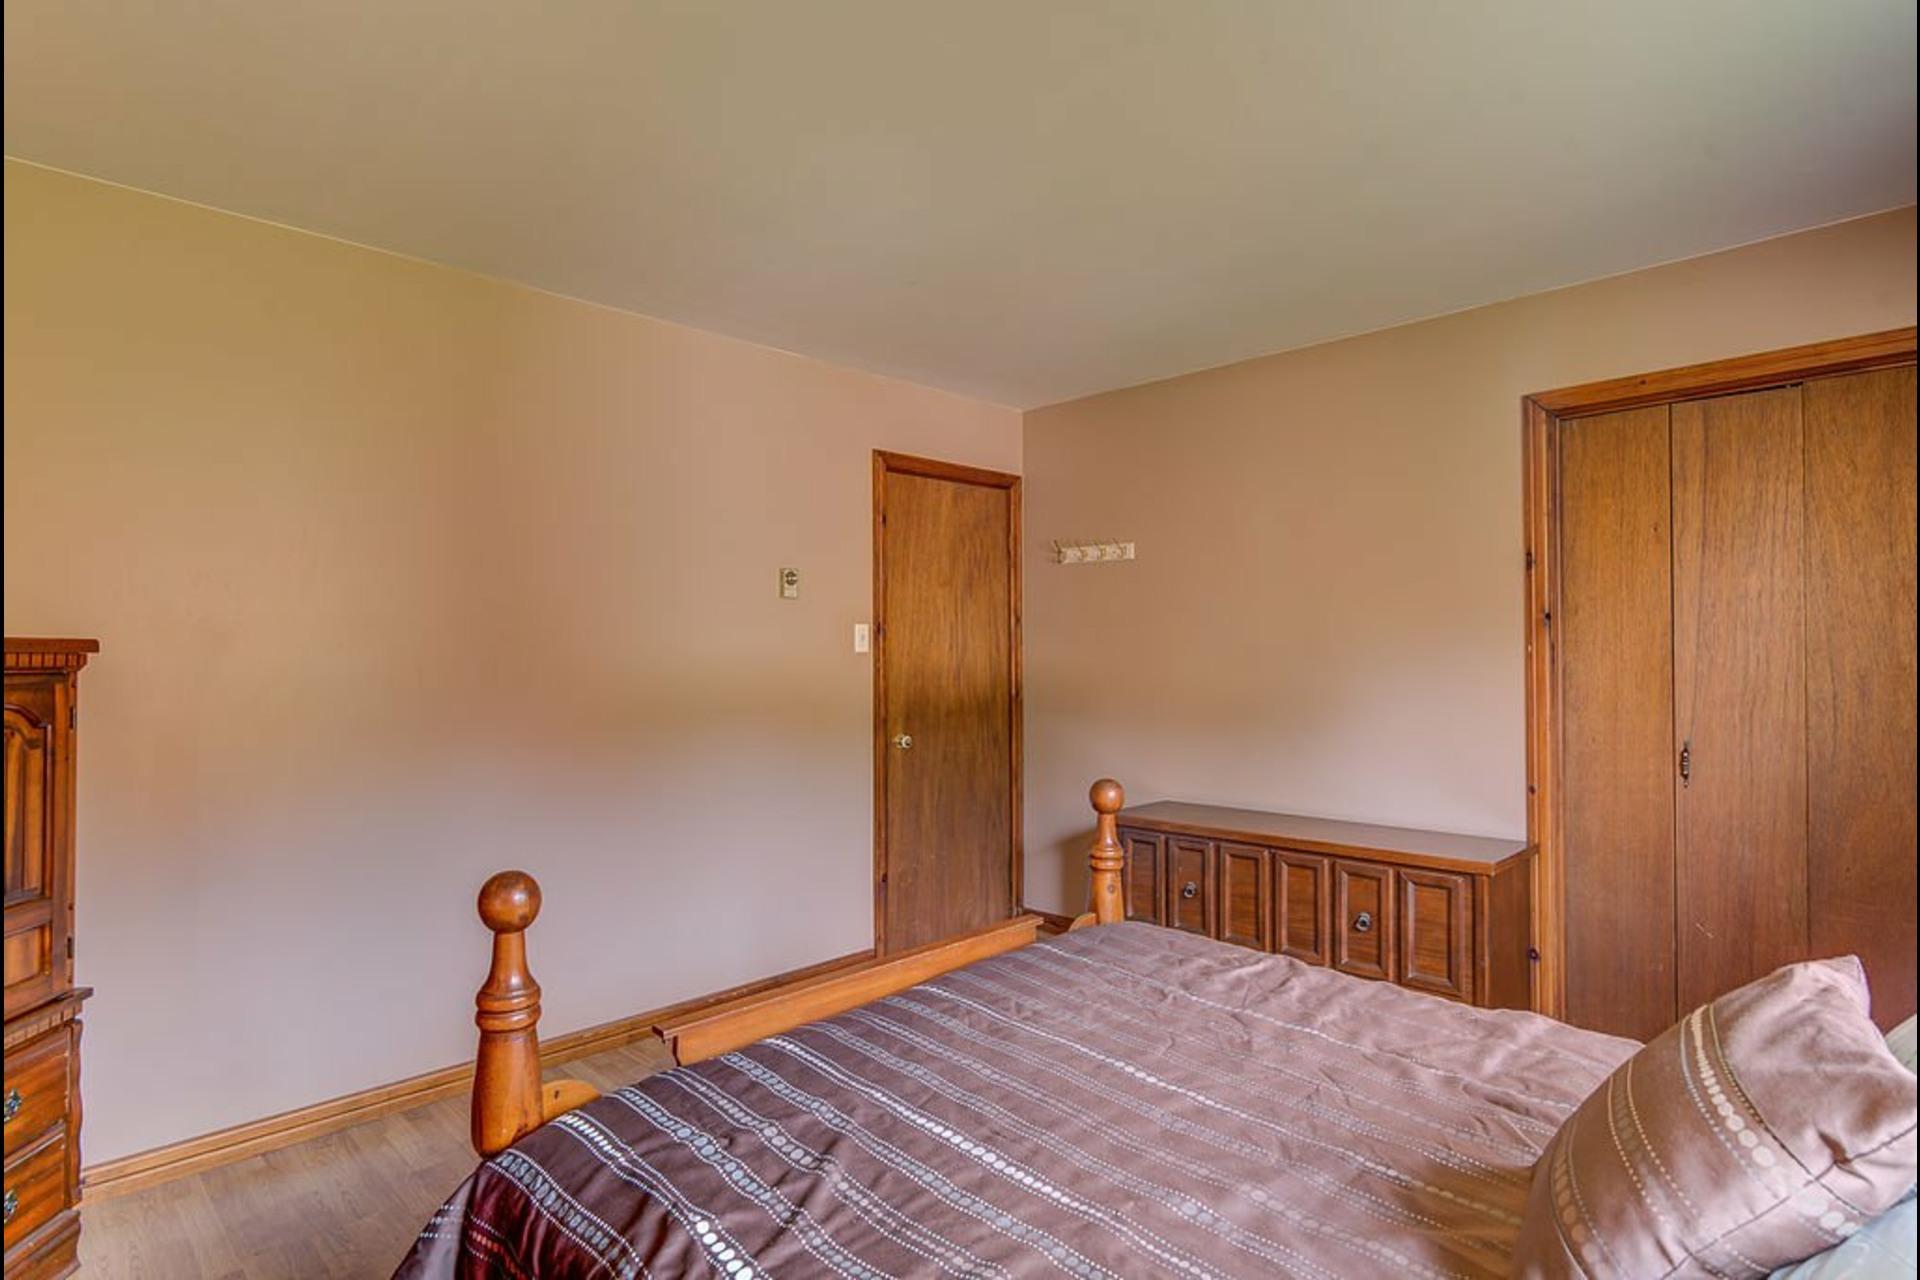 image 18 - House For sale Sainte-Sophie - 10 rooms